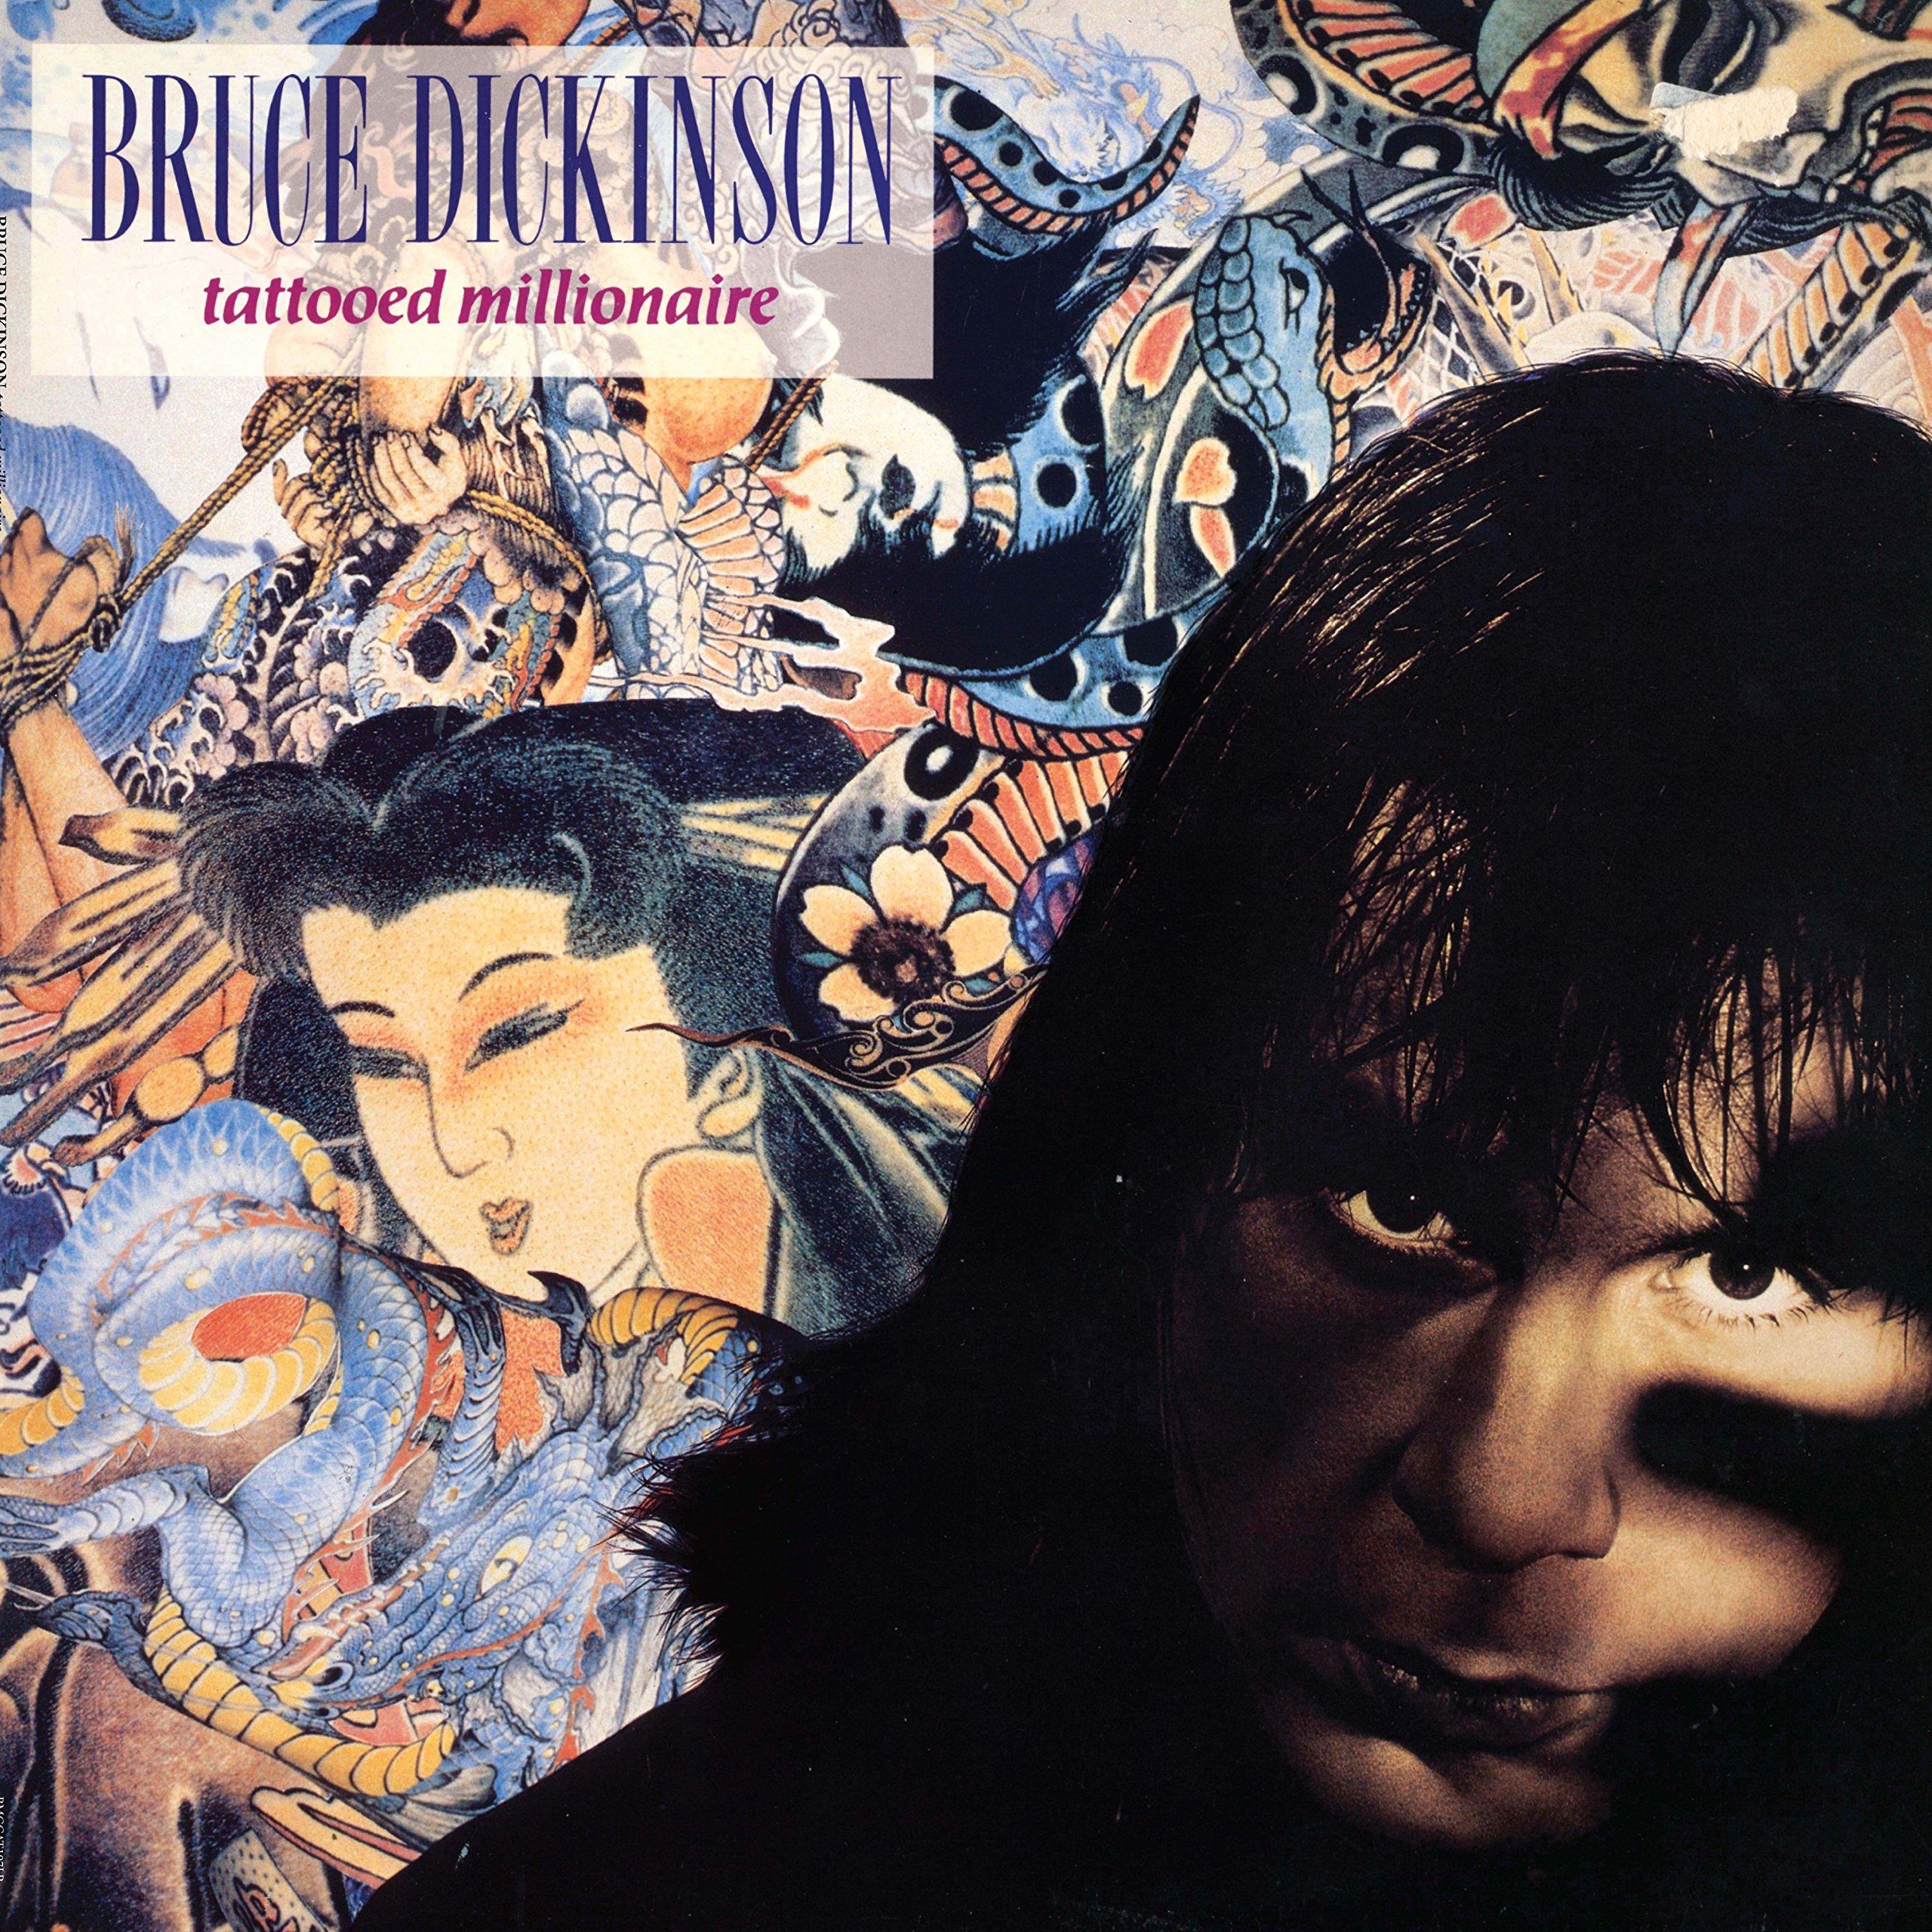 Vinilo : Bruce Dickinson - Tattooed Millionaire (180 Gram Vinyl)